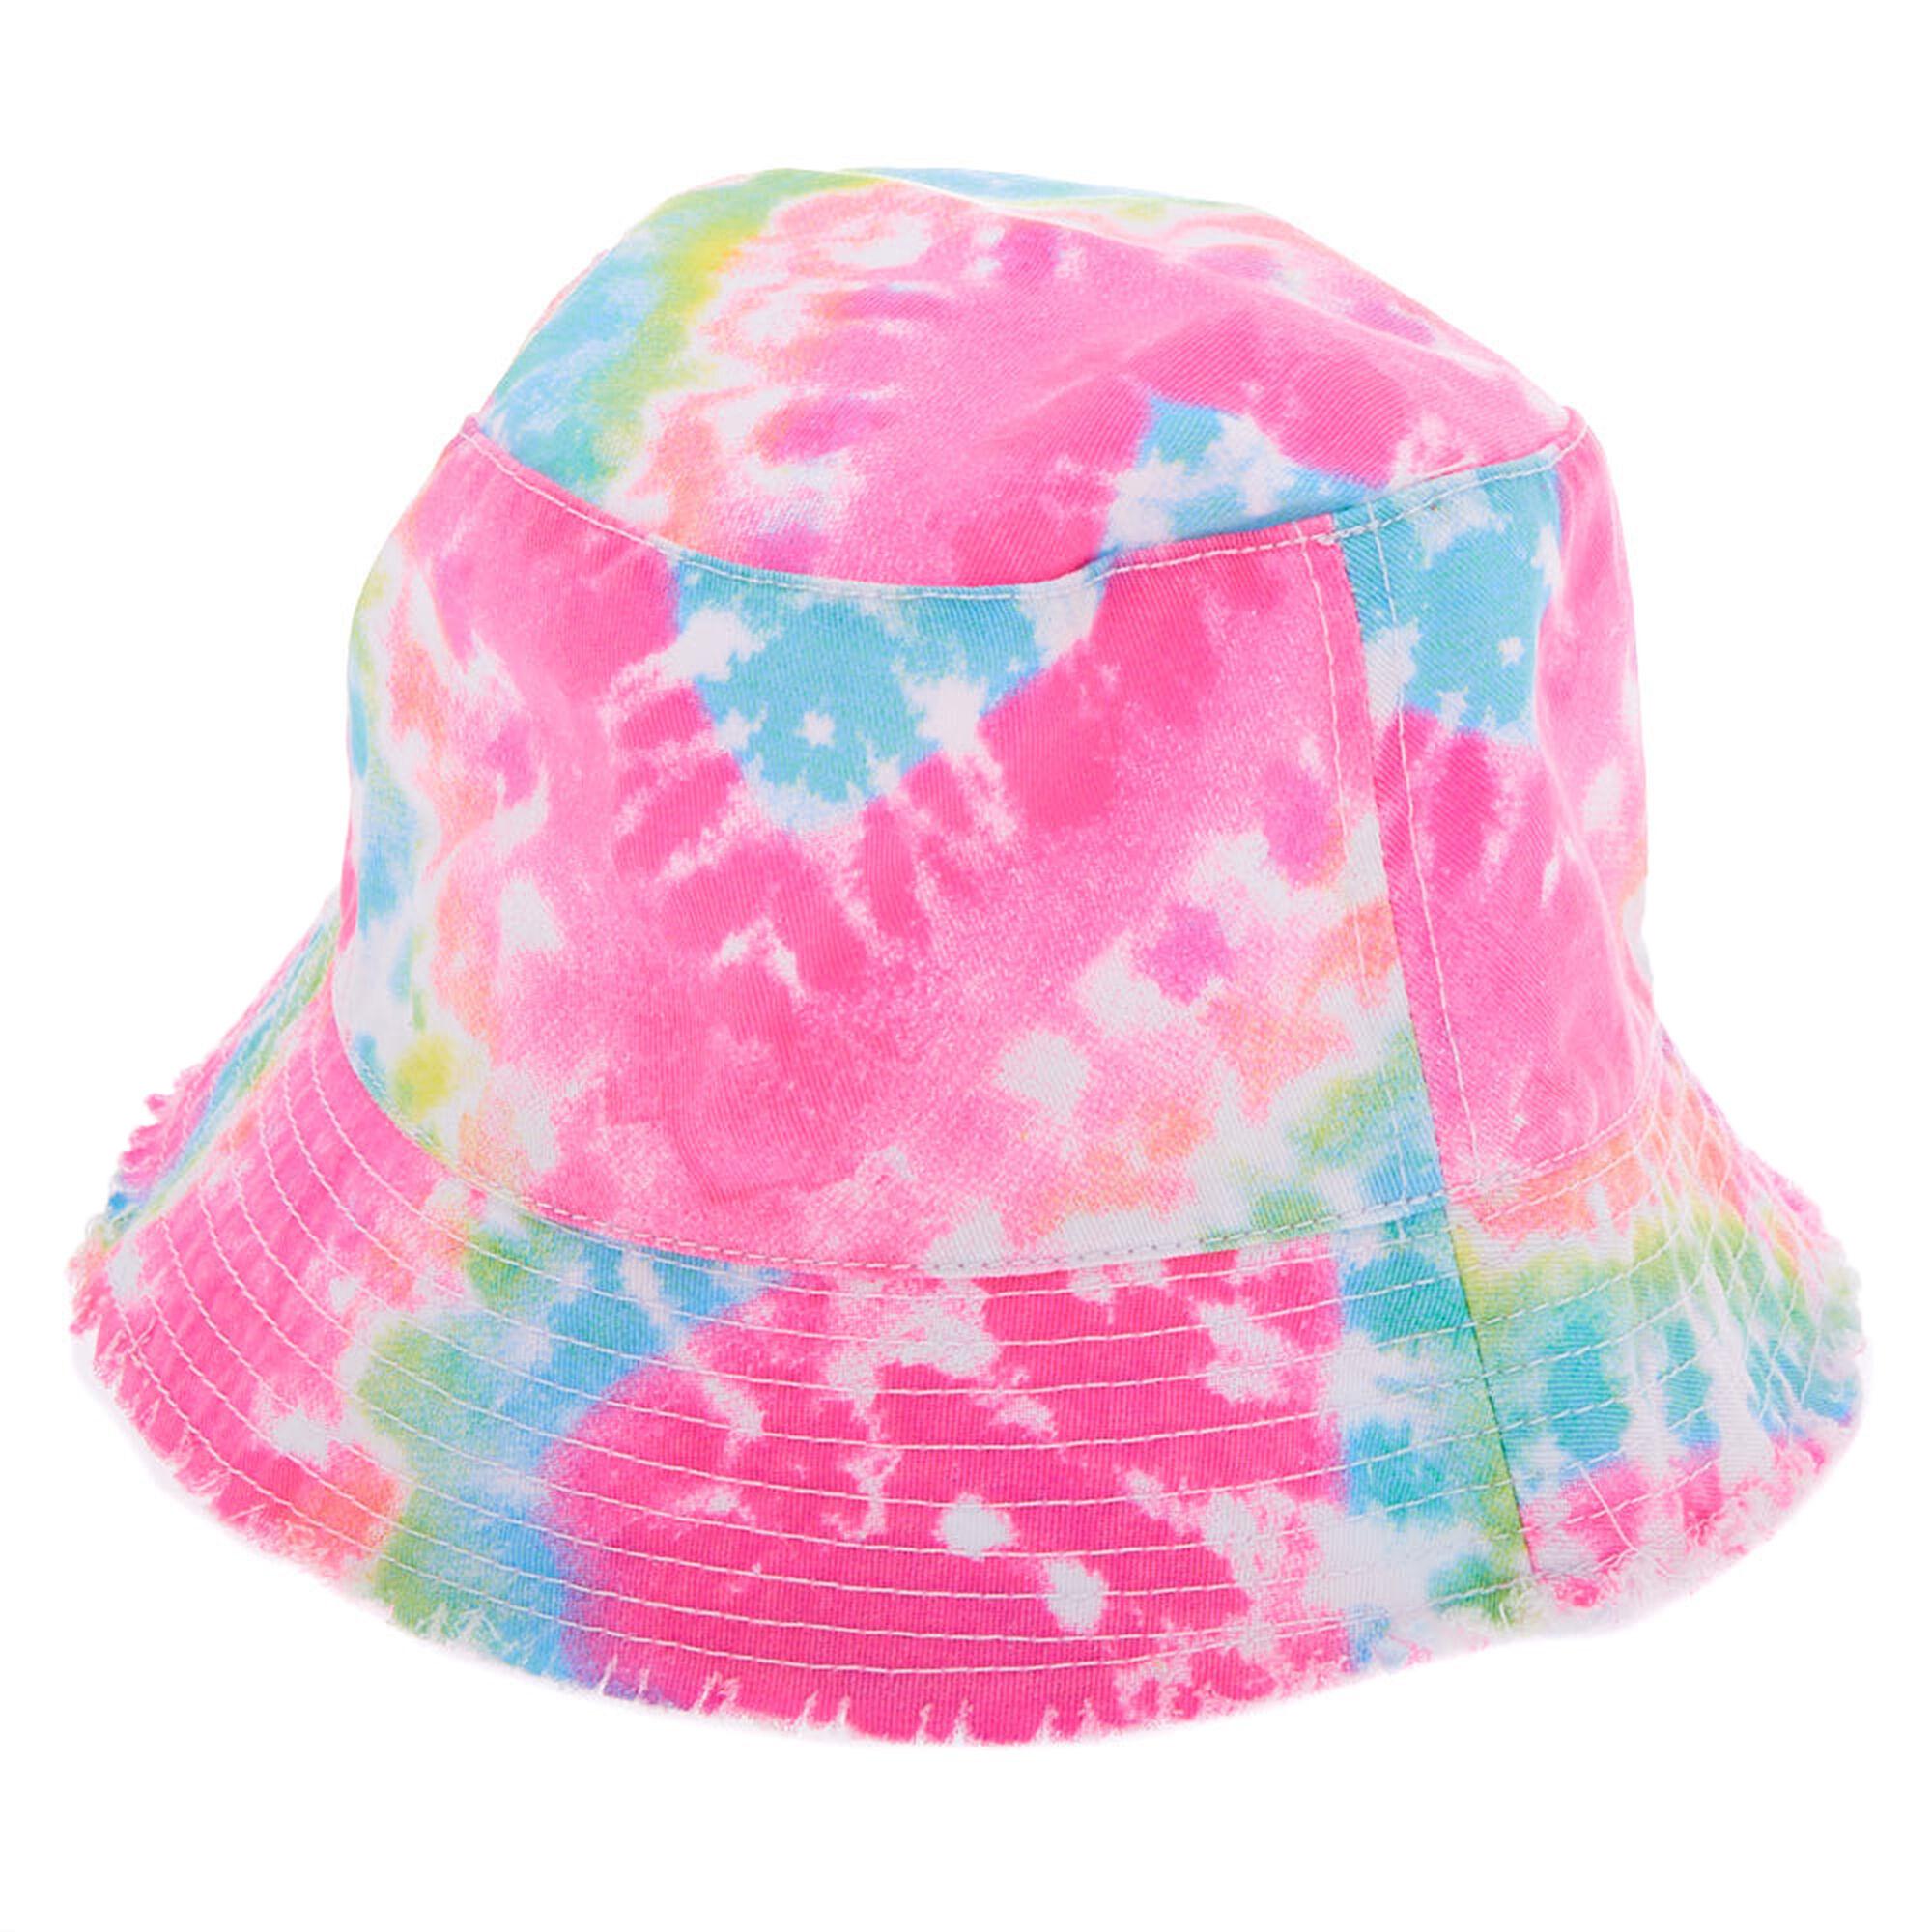 48824156481 Rainbow Tie-Dye Bucket Hat